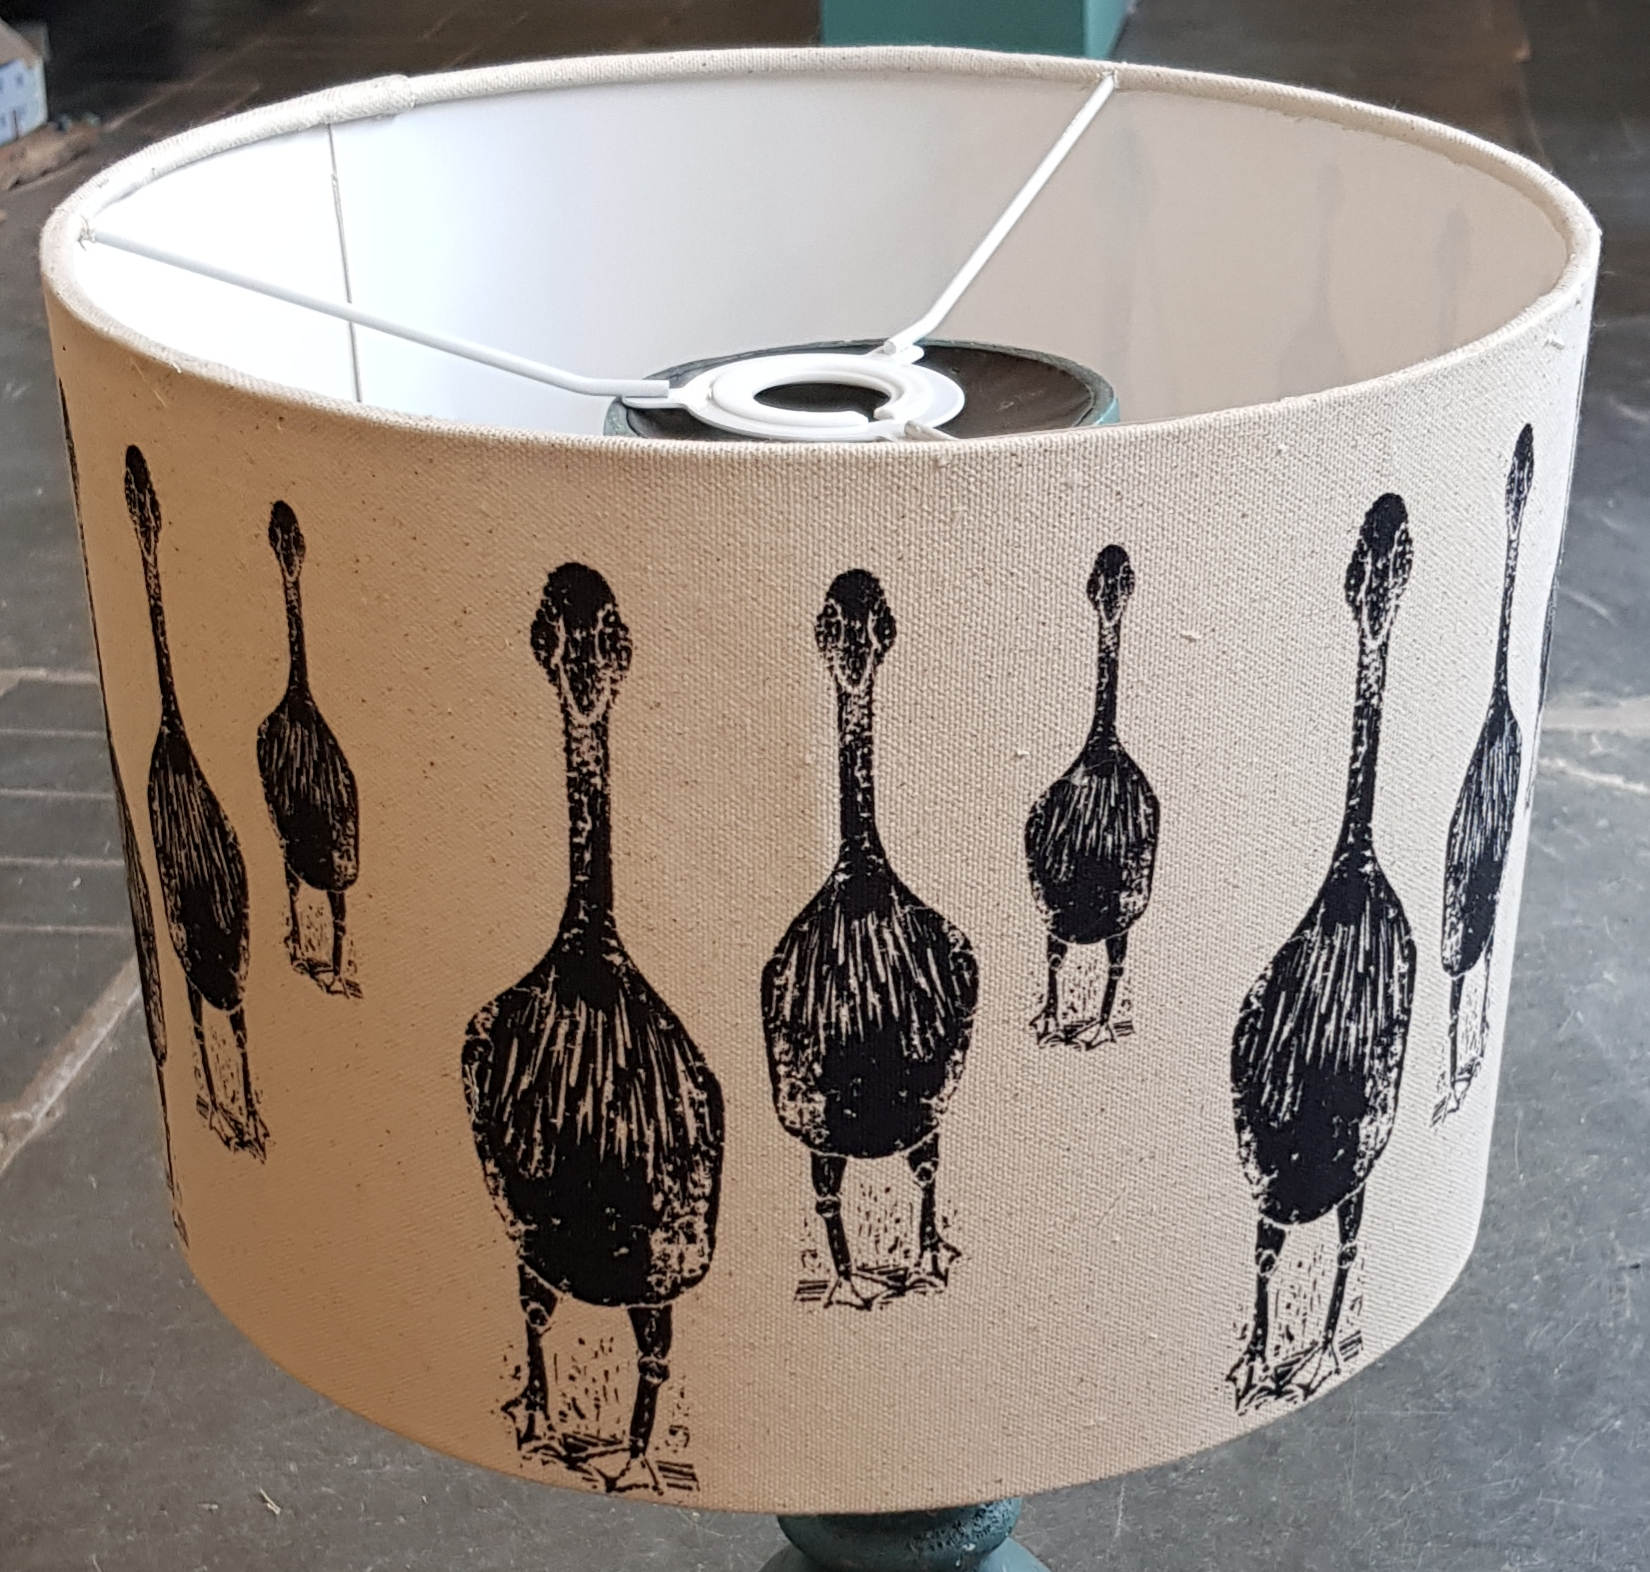 Handmade lampshade 30 cms walking geese design jane adams ceramics handmade lampshade lampshade lampshades designer lampshades fabric lampshade printed lampshade aloadofball Choice Image